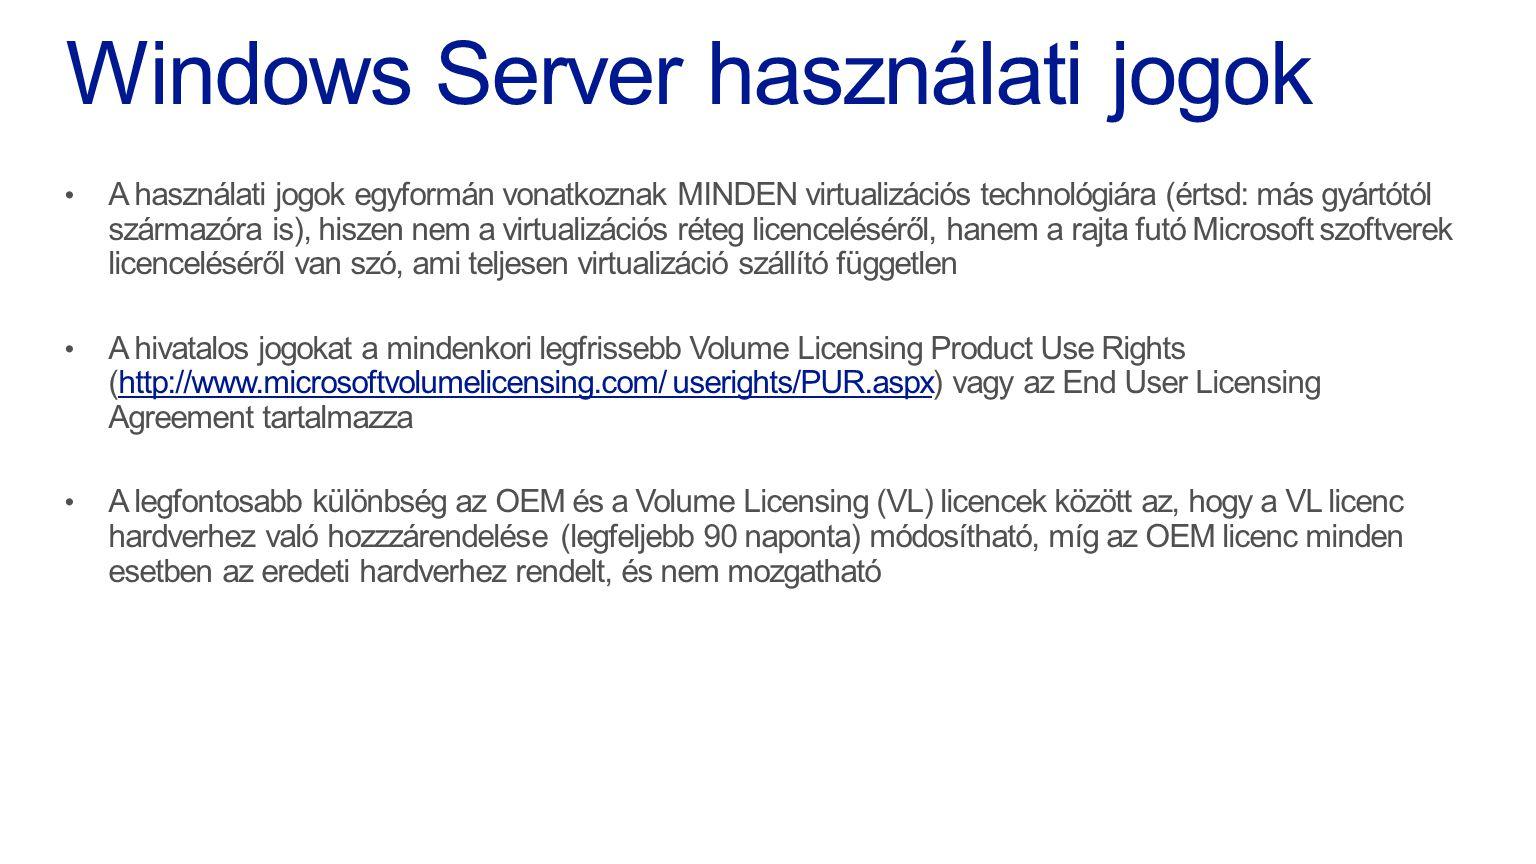 Windows Server használati jogok